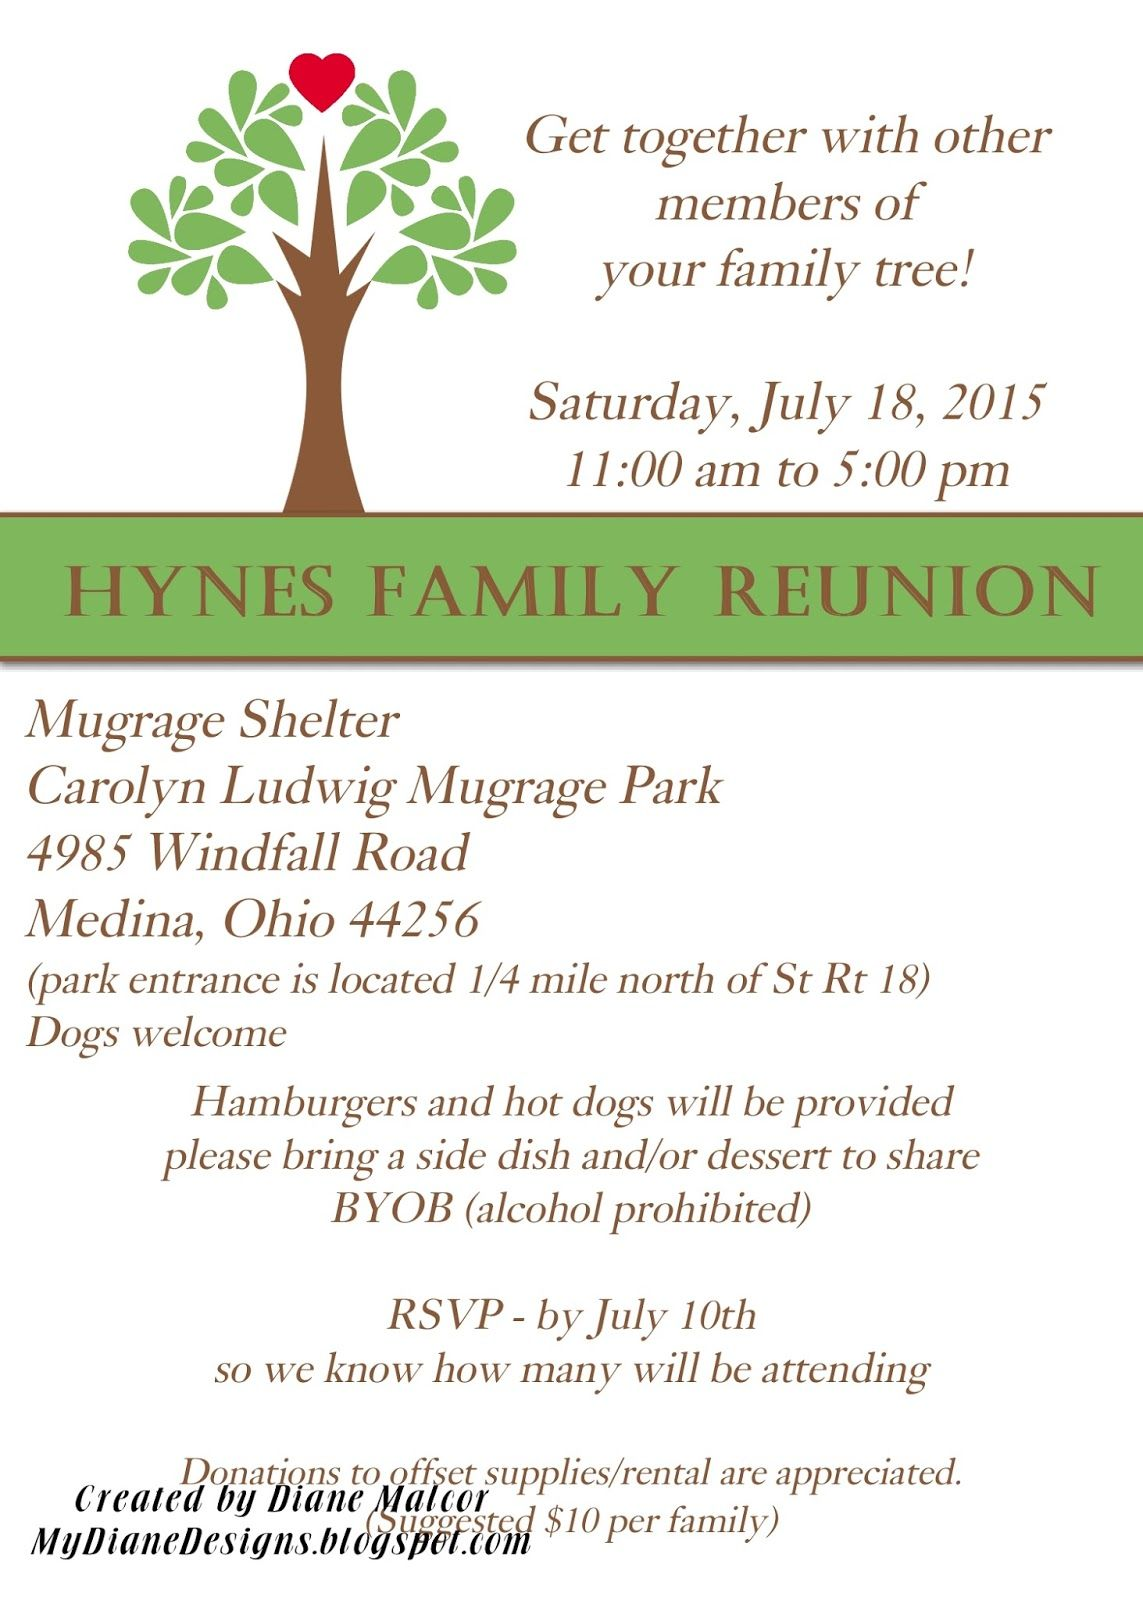 Family Reunion Invite Family Reunion Invitations Reunion Invitations Family Reunion Family reunion invitation template free